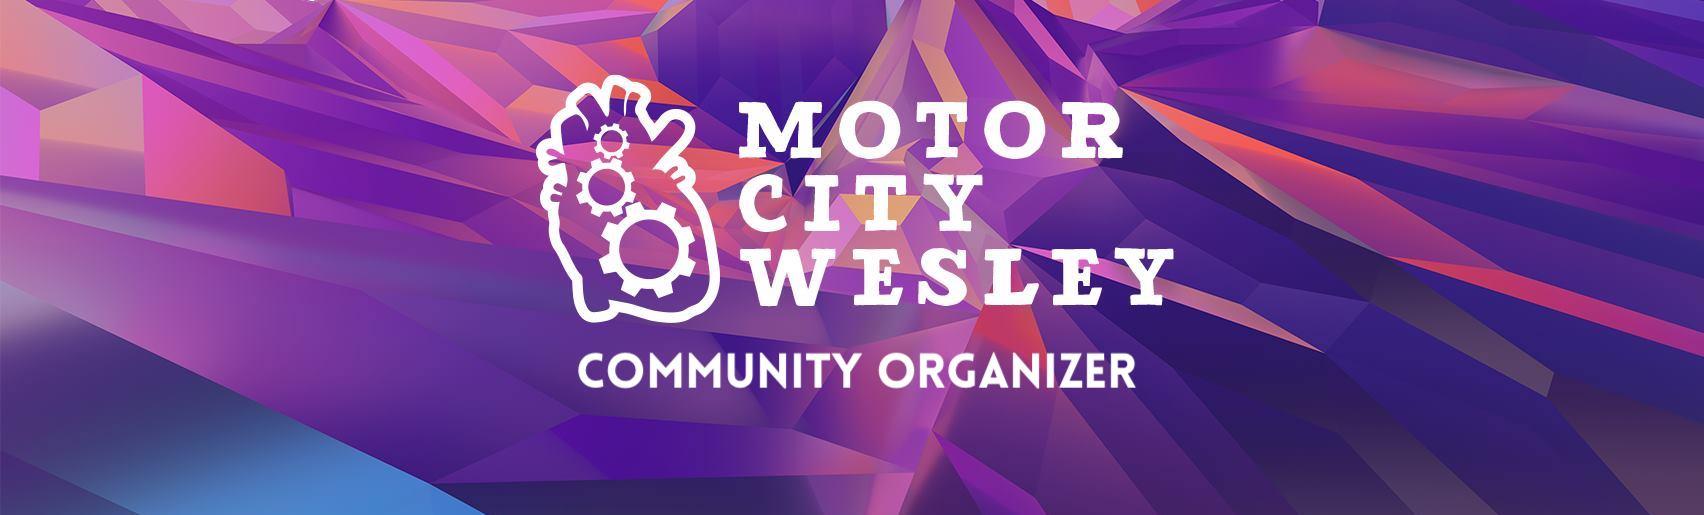 Motor City Wesley